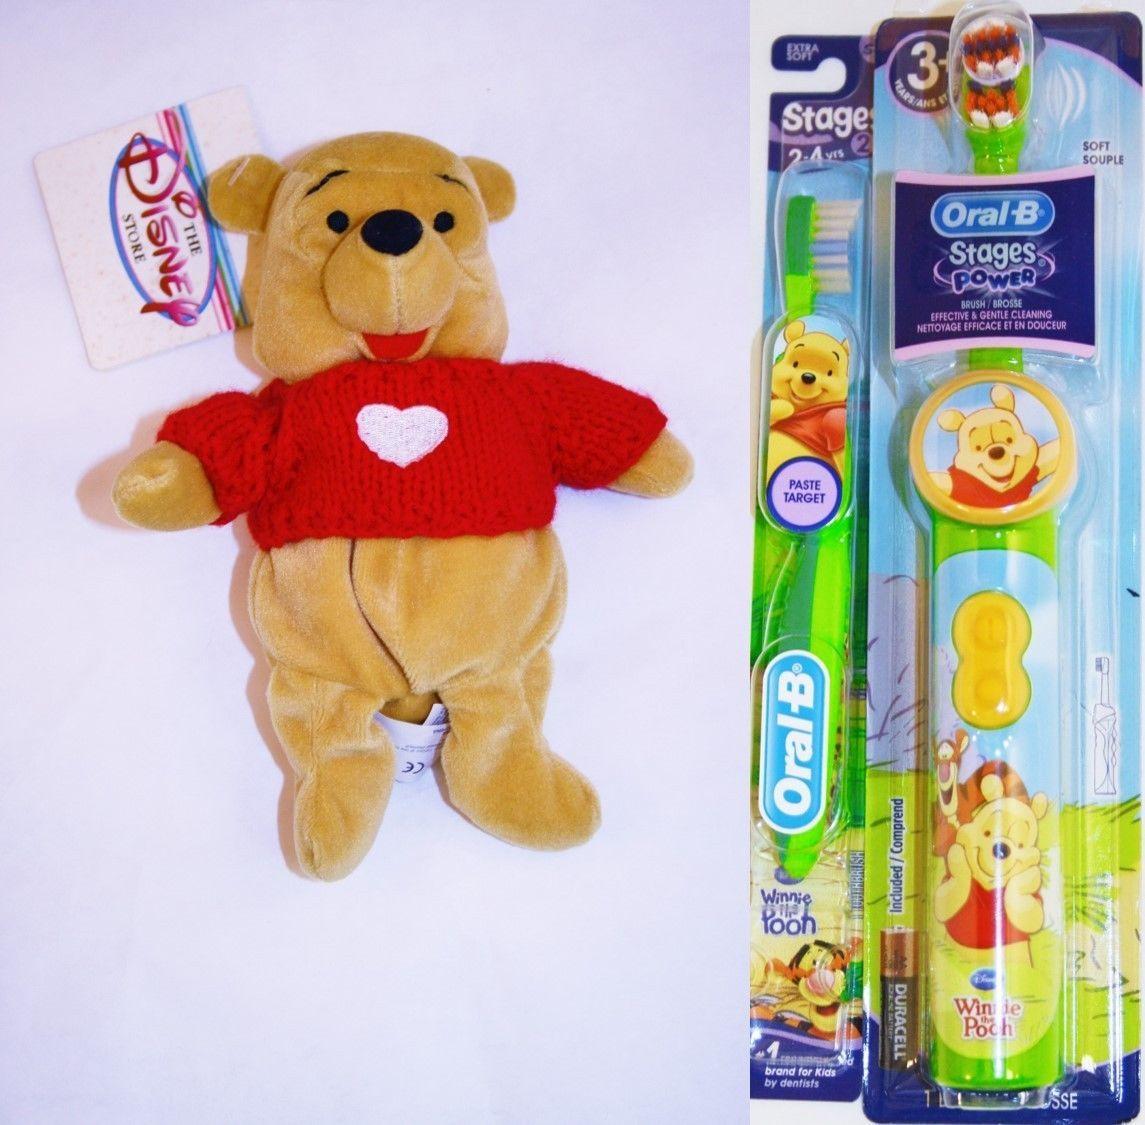 Pleasant Disney Winnie The Pooh Bean Bag Pooh Bear And 28 Similar Items Ncnpc Chair Design For Home Ncnpcorg